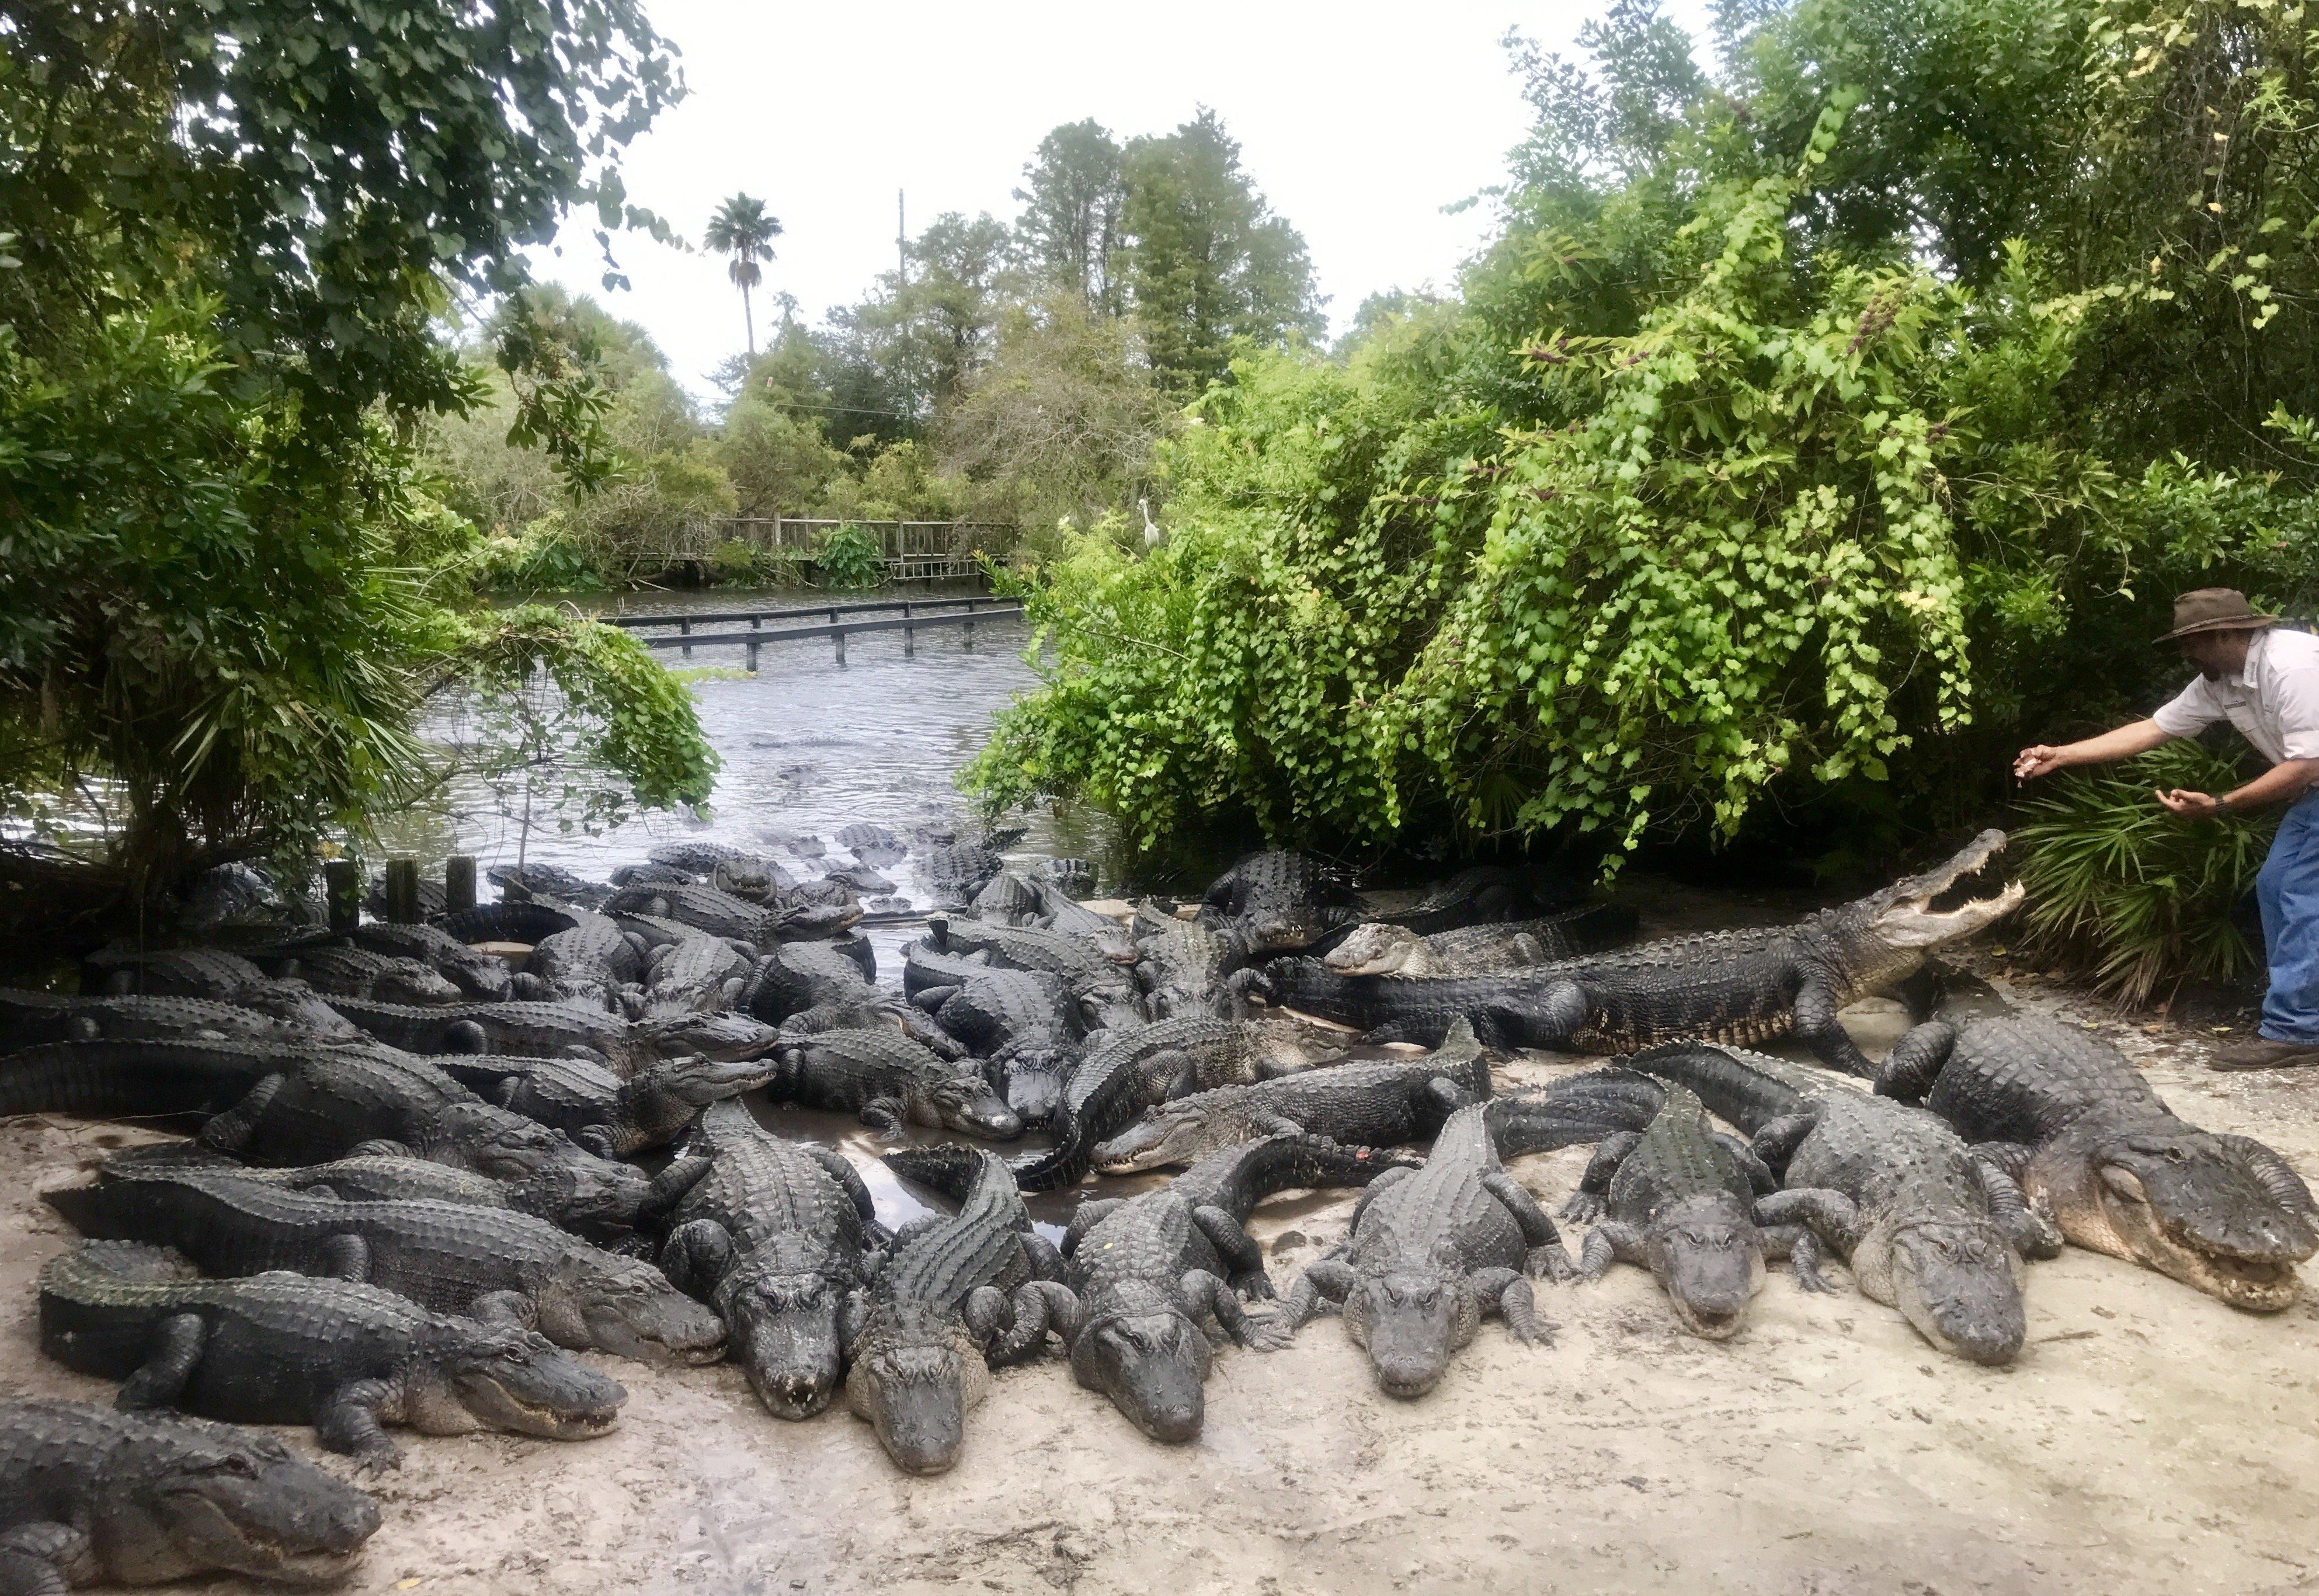 Gator Park Preps 2,000 Alligators For Irma, Promises None Will